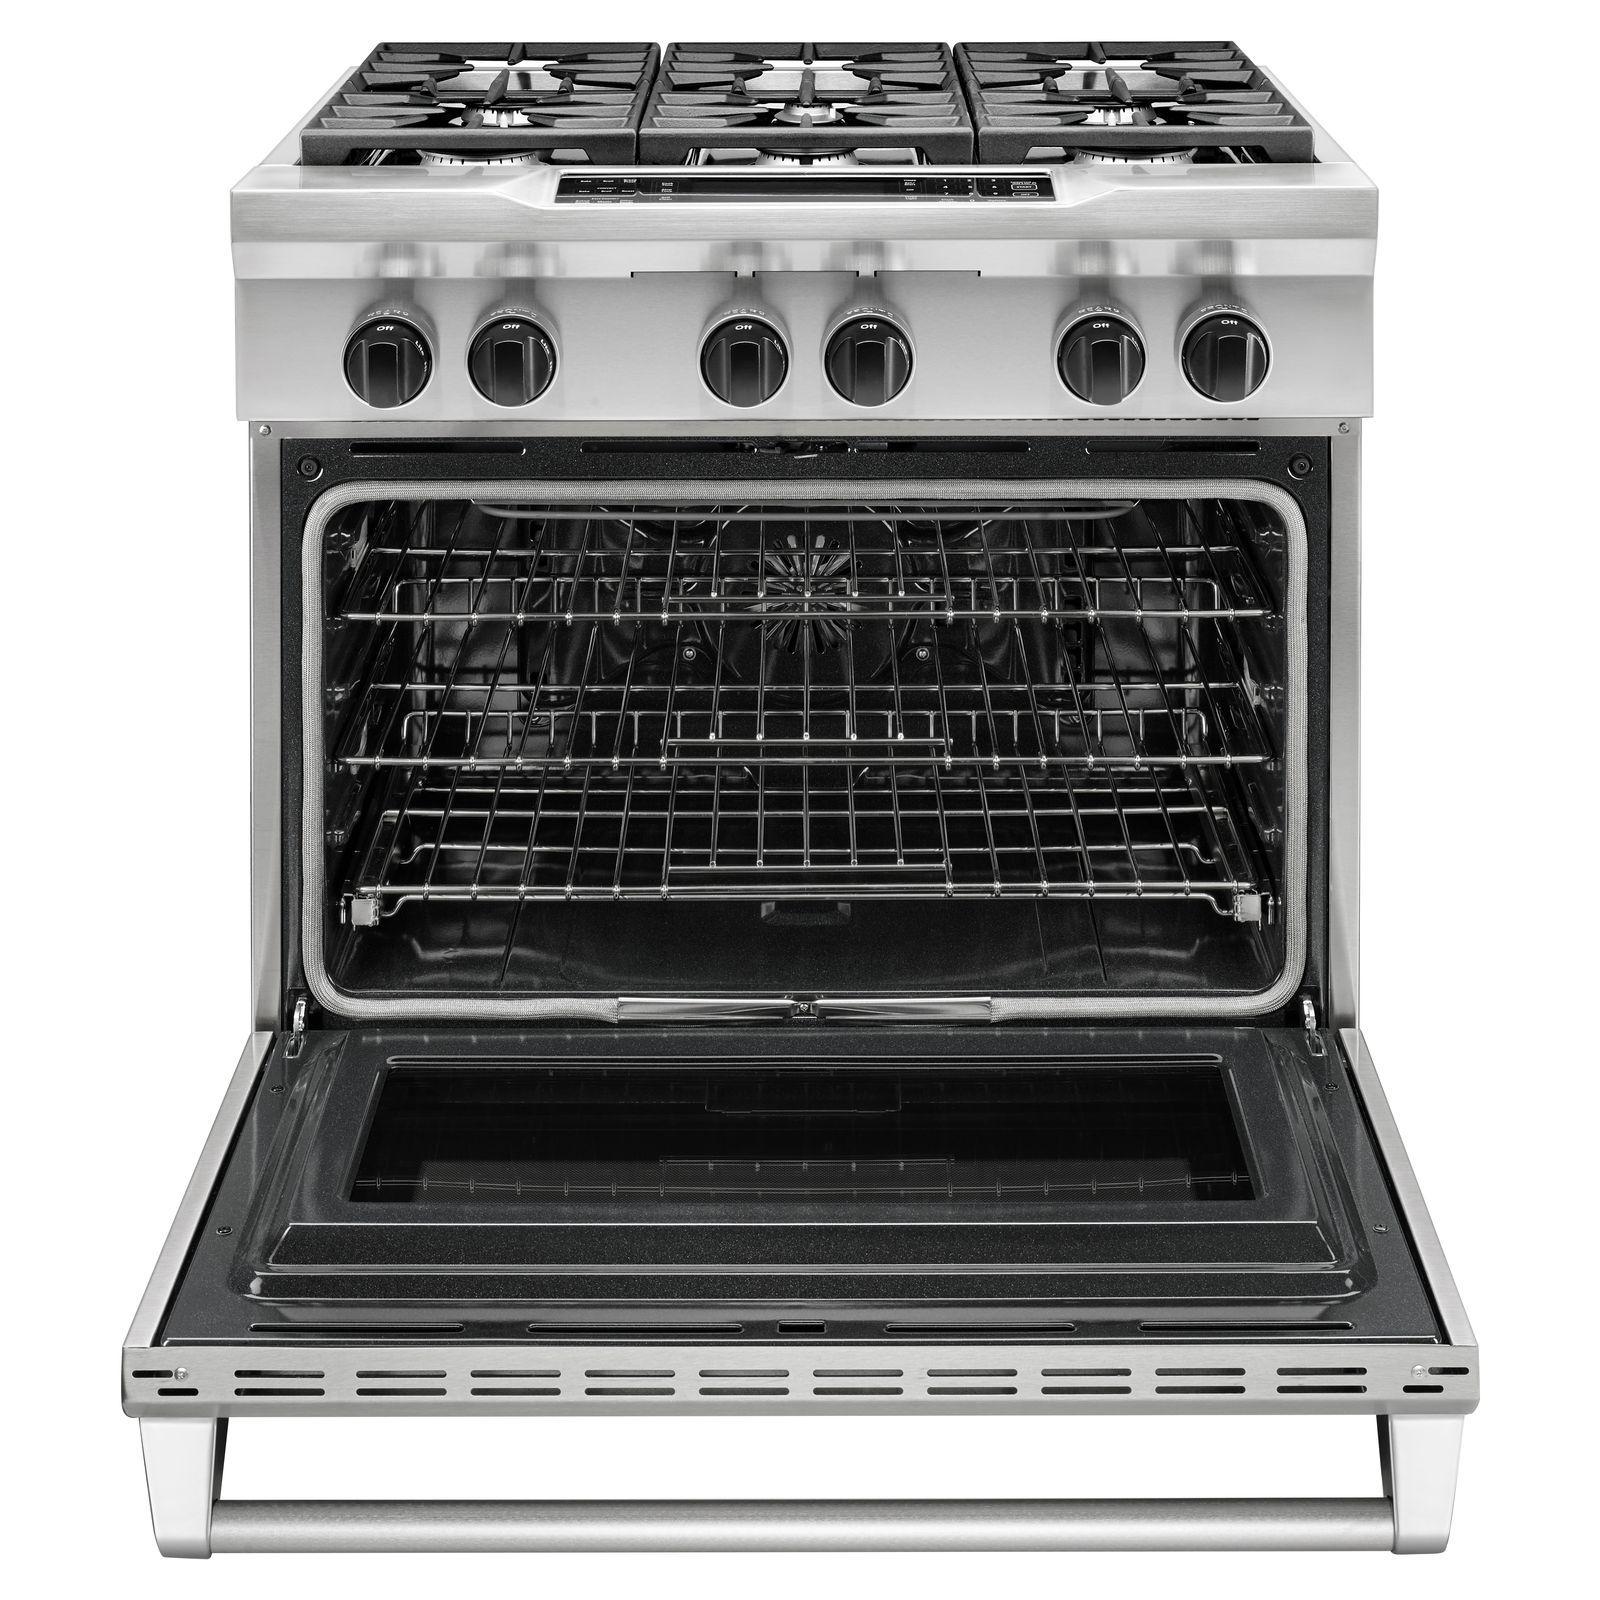 Delicieux KitchenAid KDRS467VSS Pro Style 5.1 Cu. Ft. Dual Fuel Range   Stainless  Steel